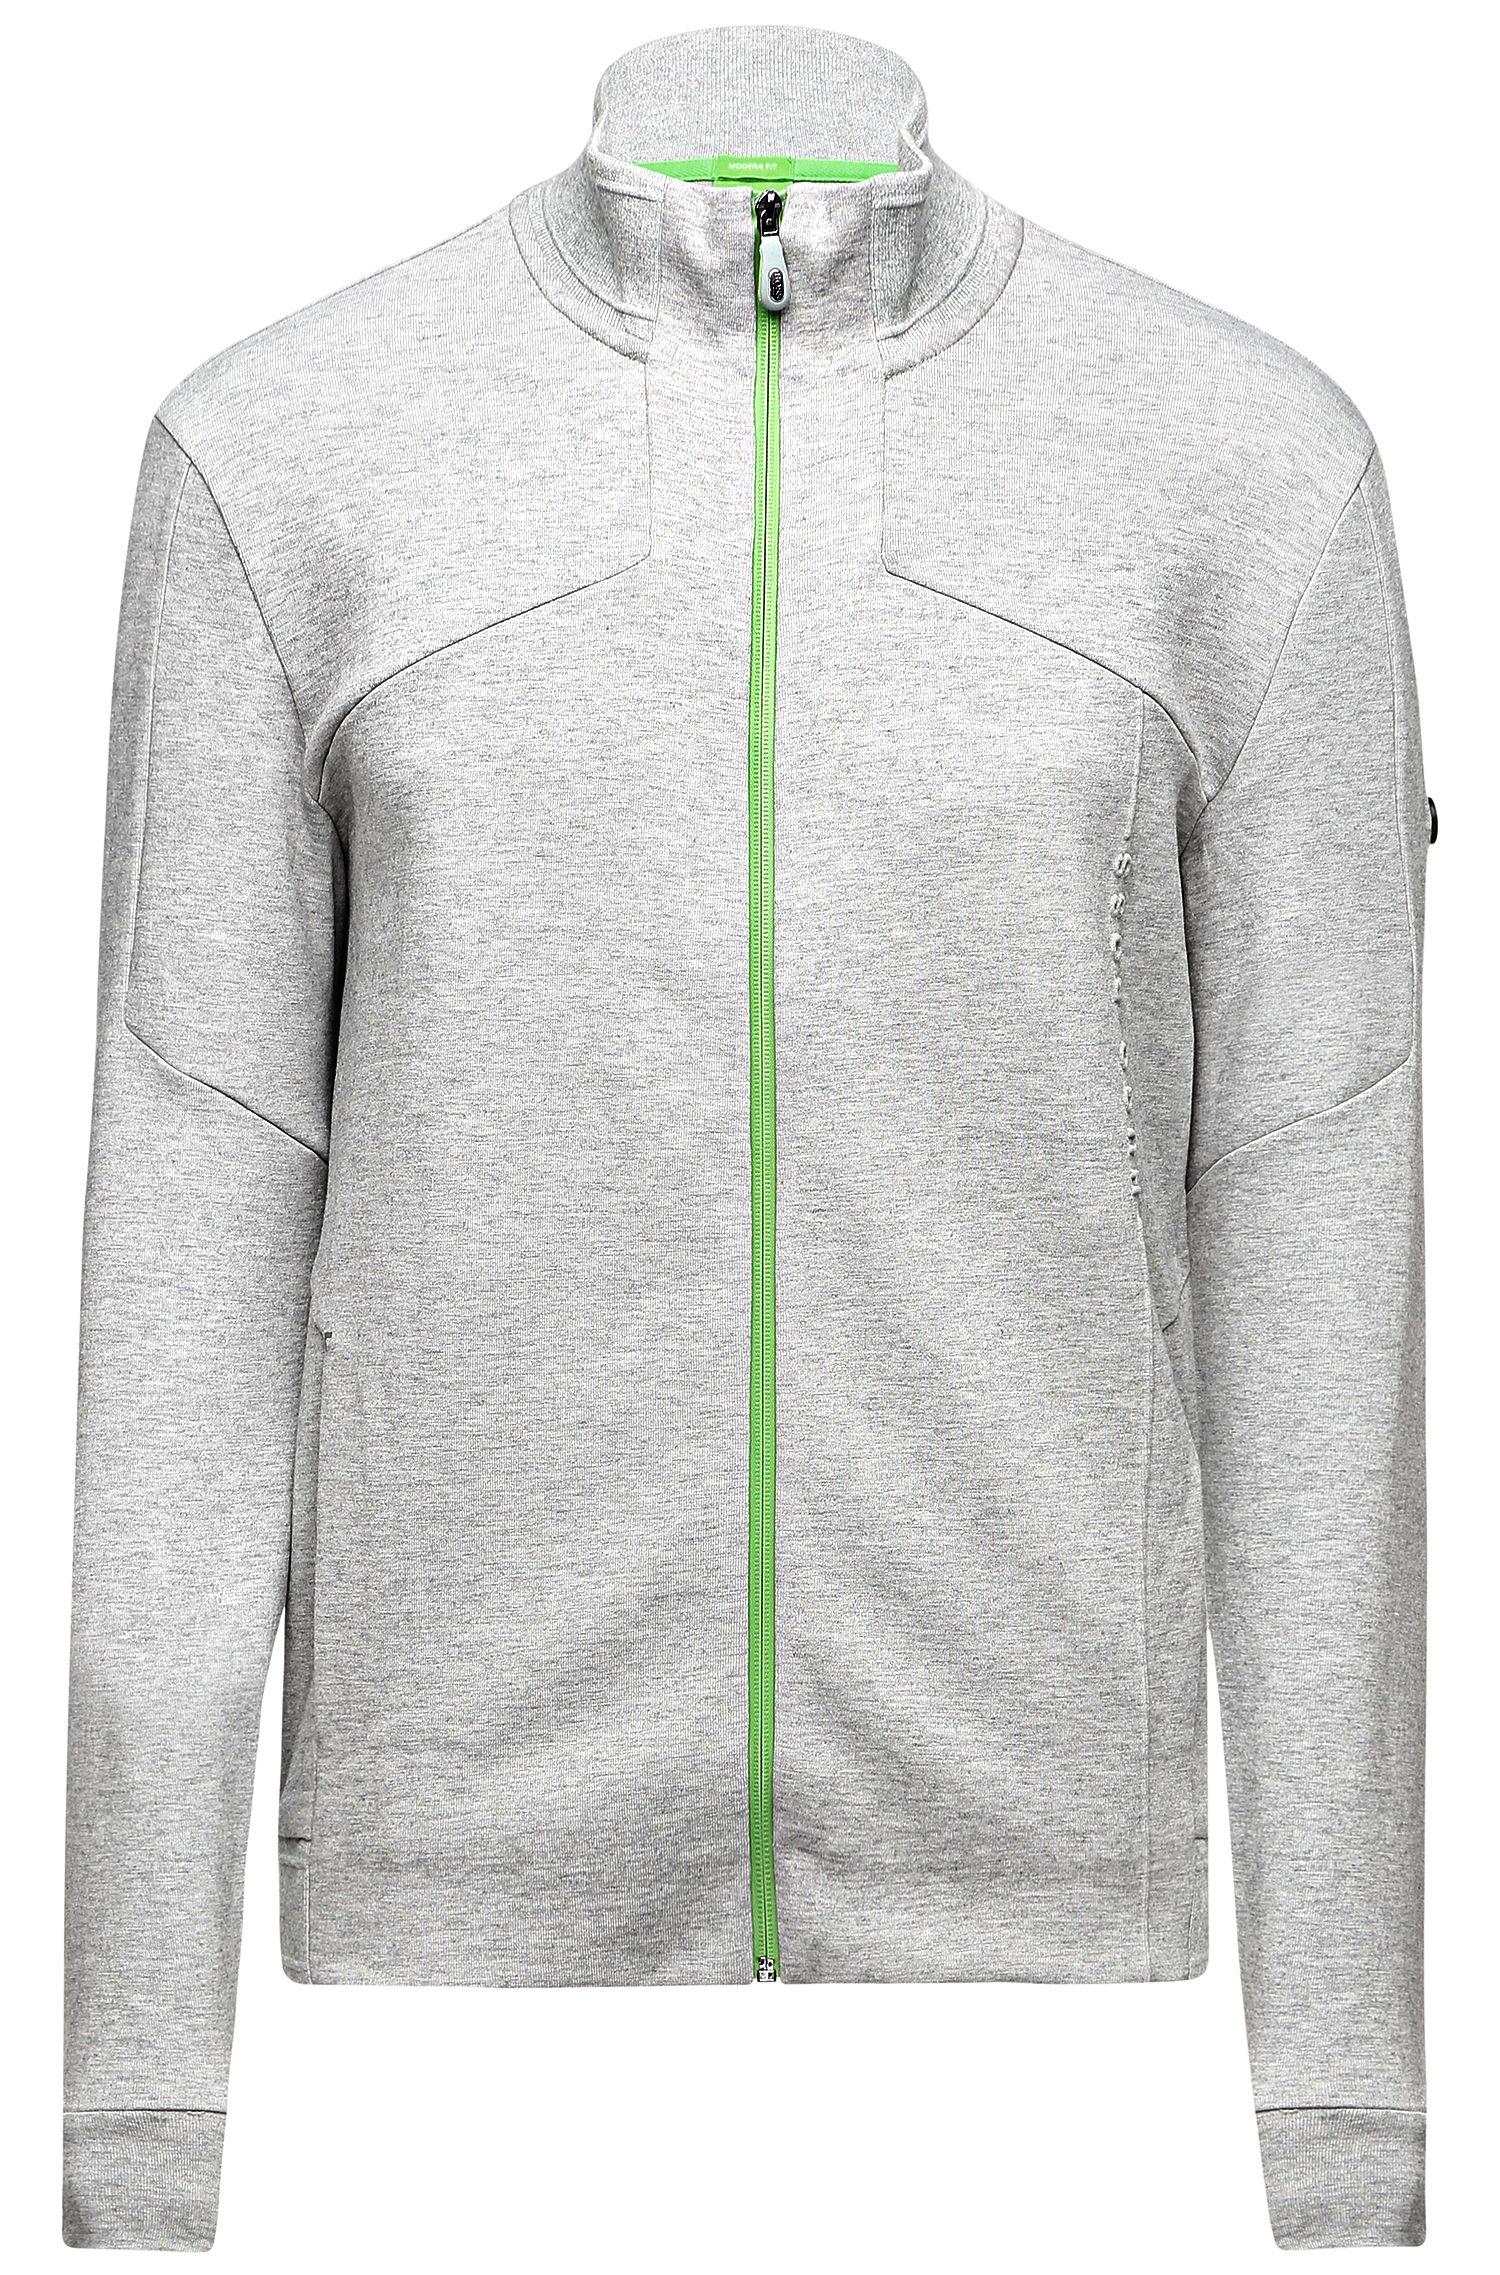 'Skaron' | Cotton Blend Sweatshirt Jacket